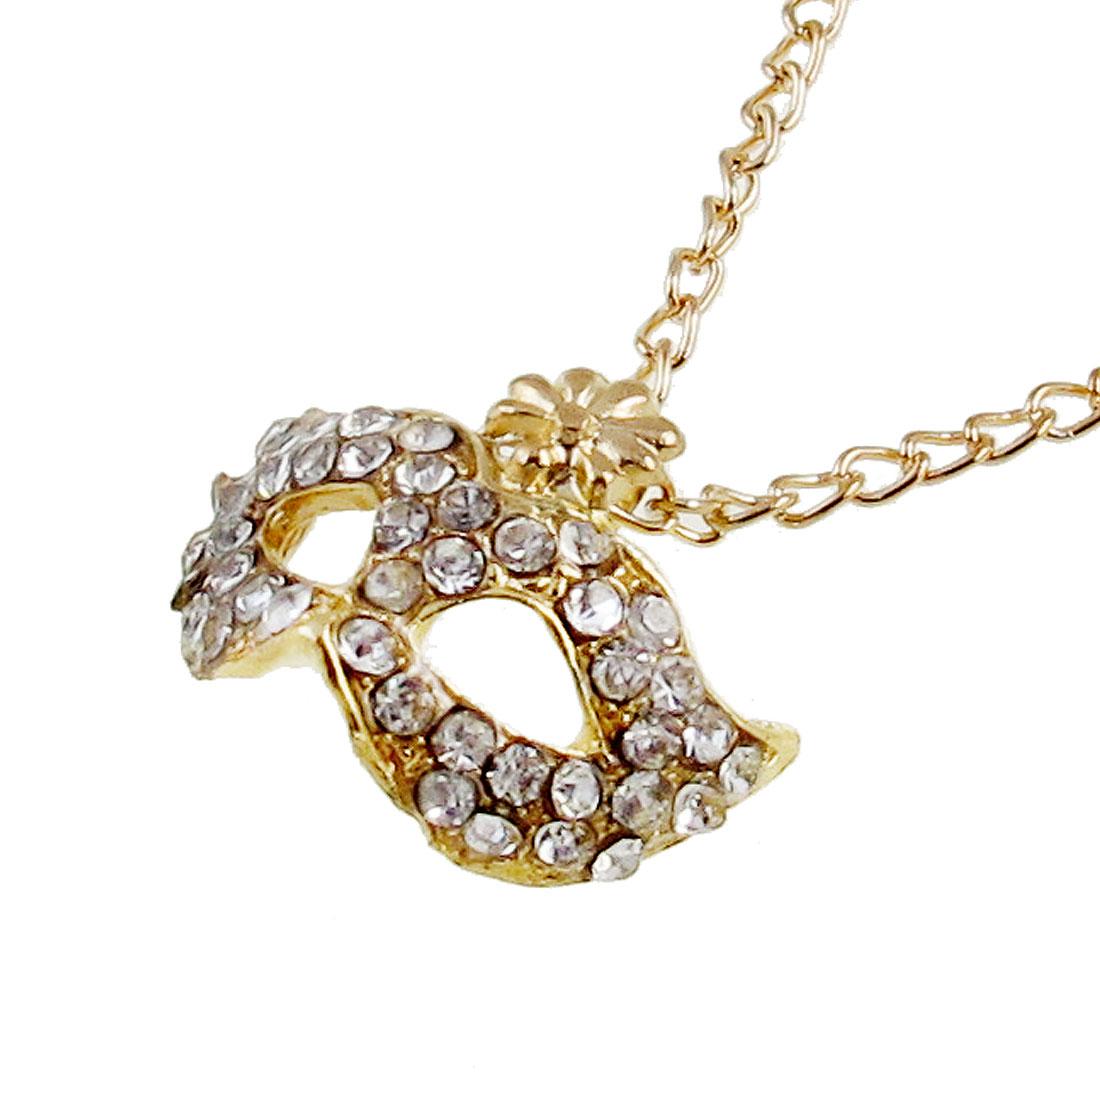 Gold Tone Rhinestone Decor Opera Bohemian Mask With Flower Collarbone Short Necklace